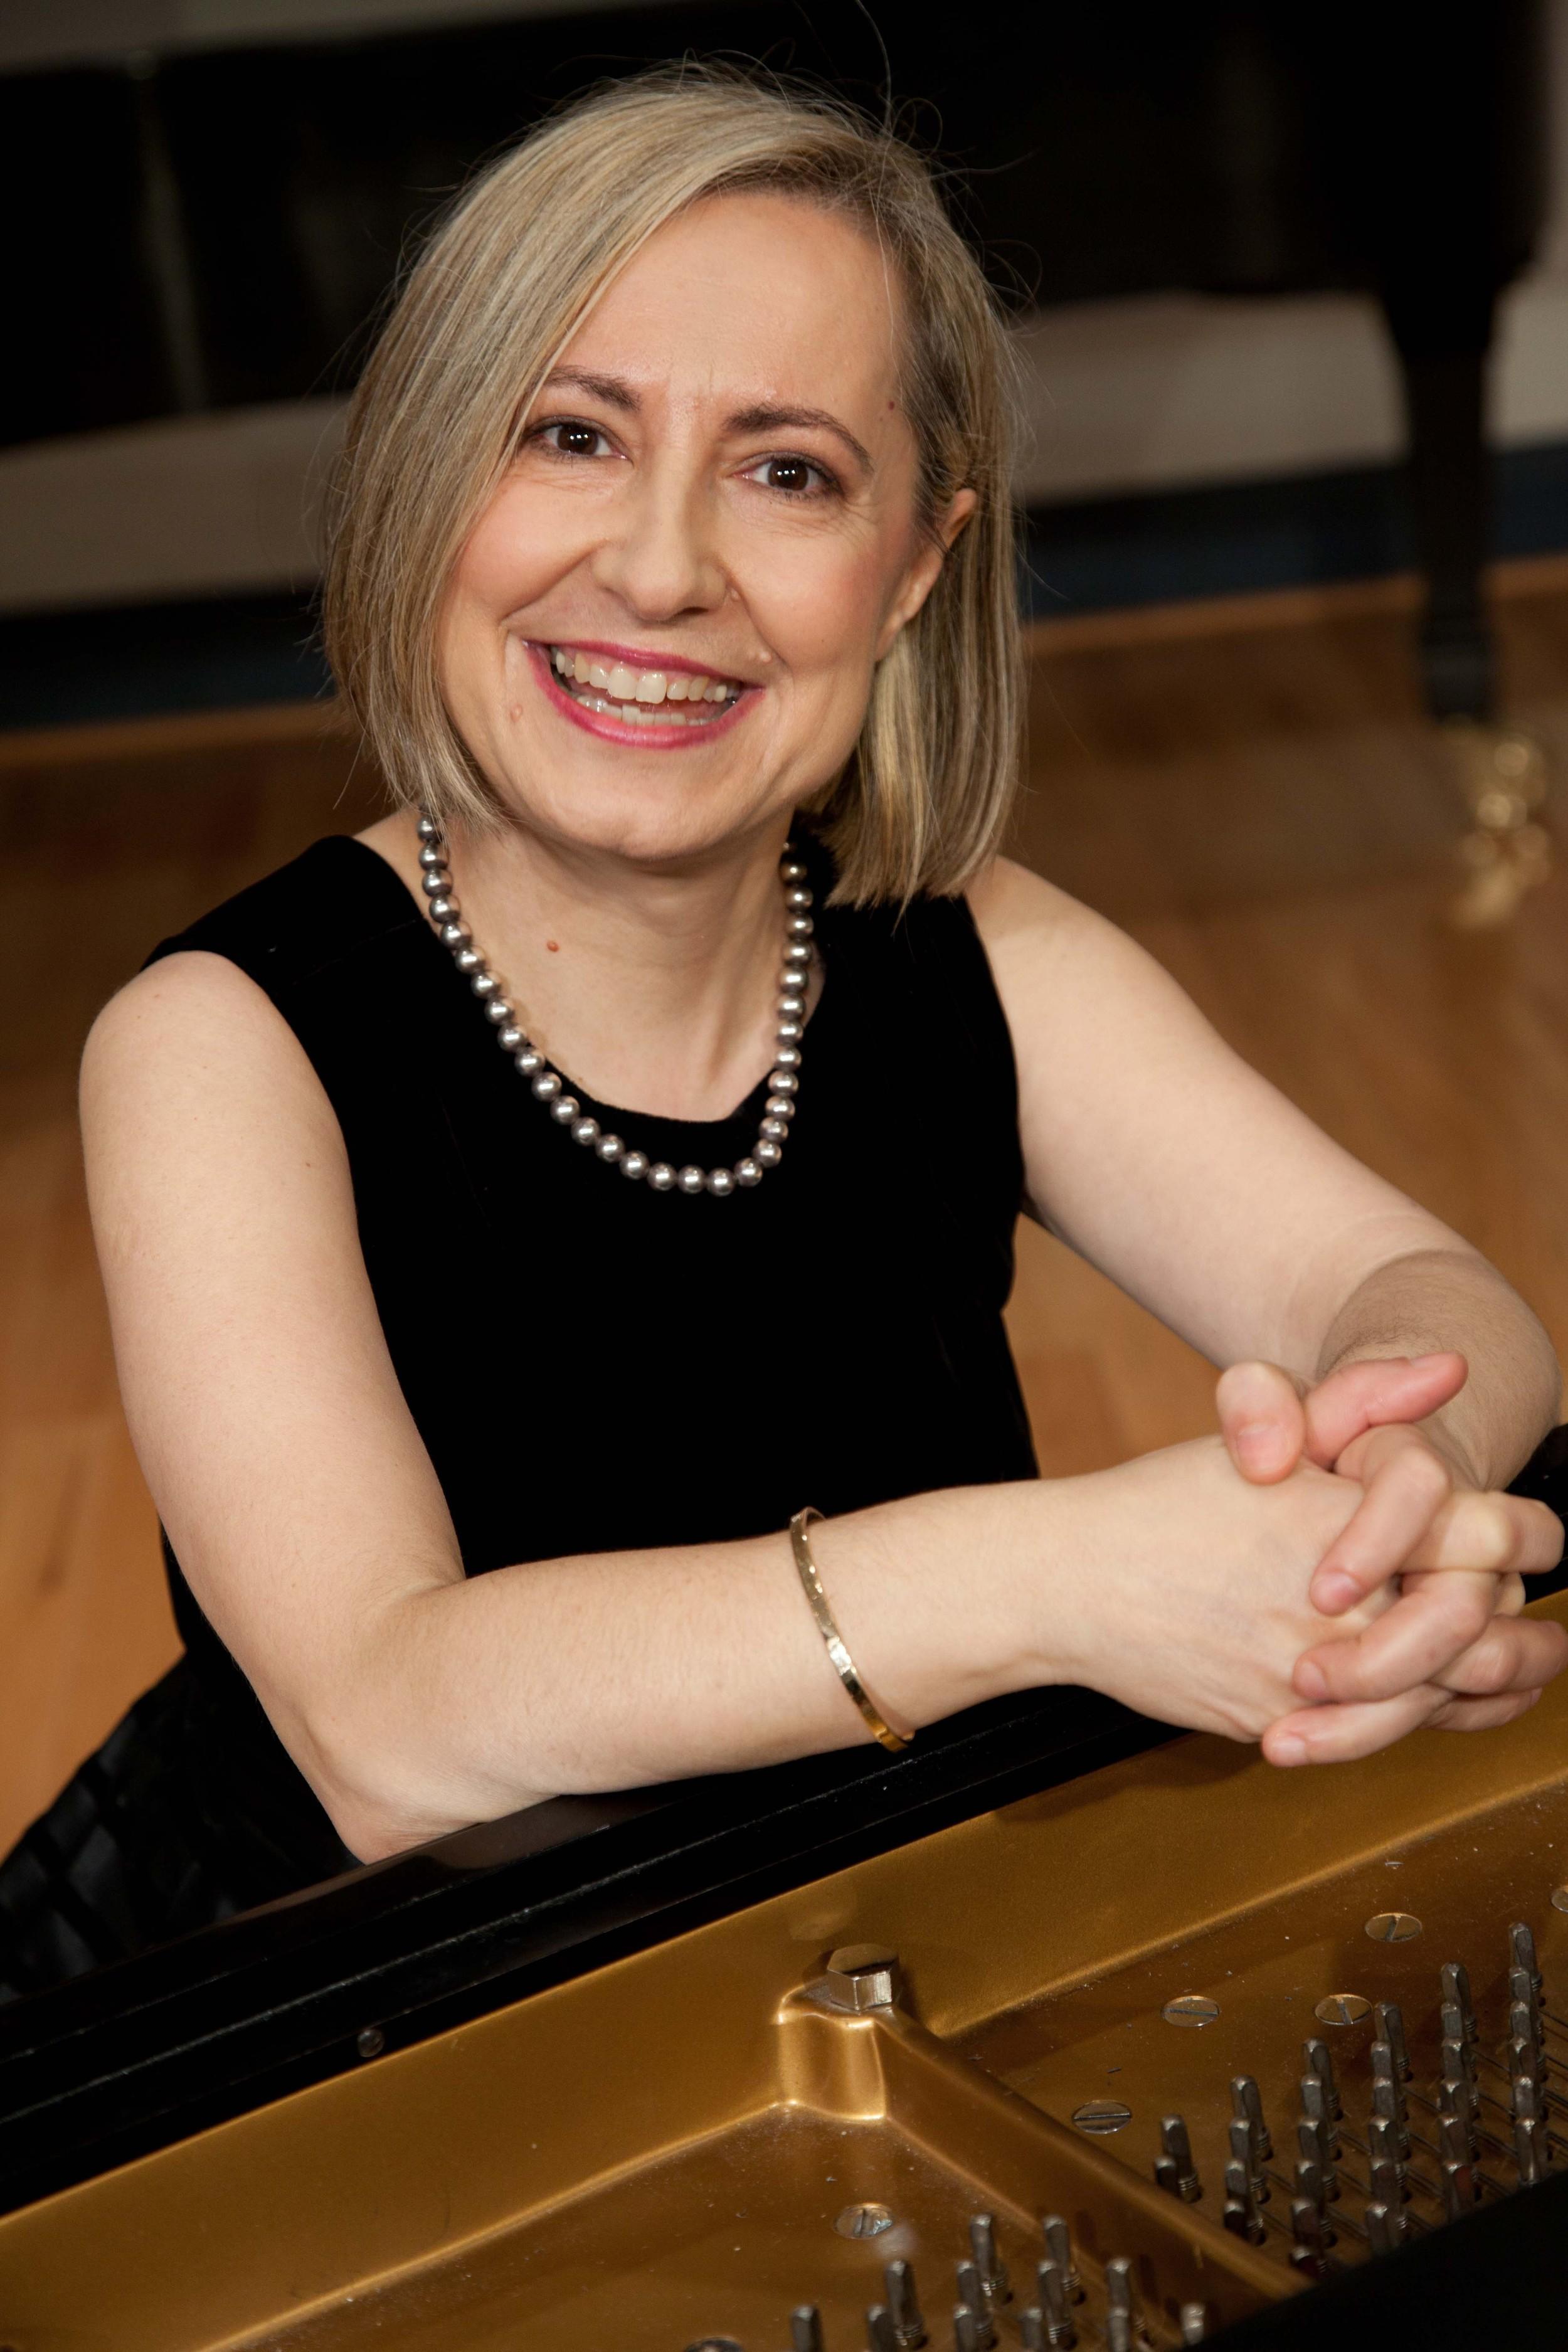 Pavlina Dokovska, aRTIST dIRECTOR